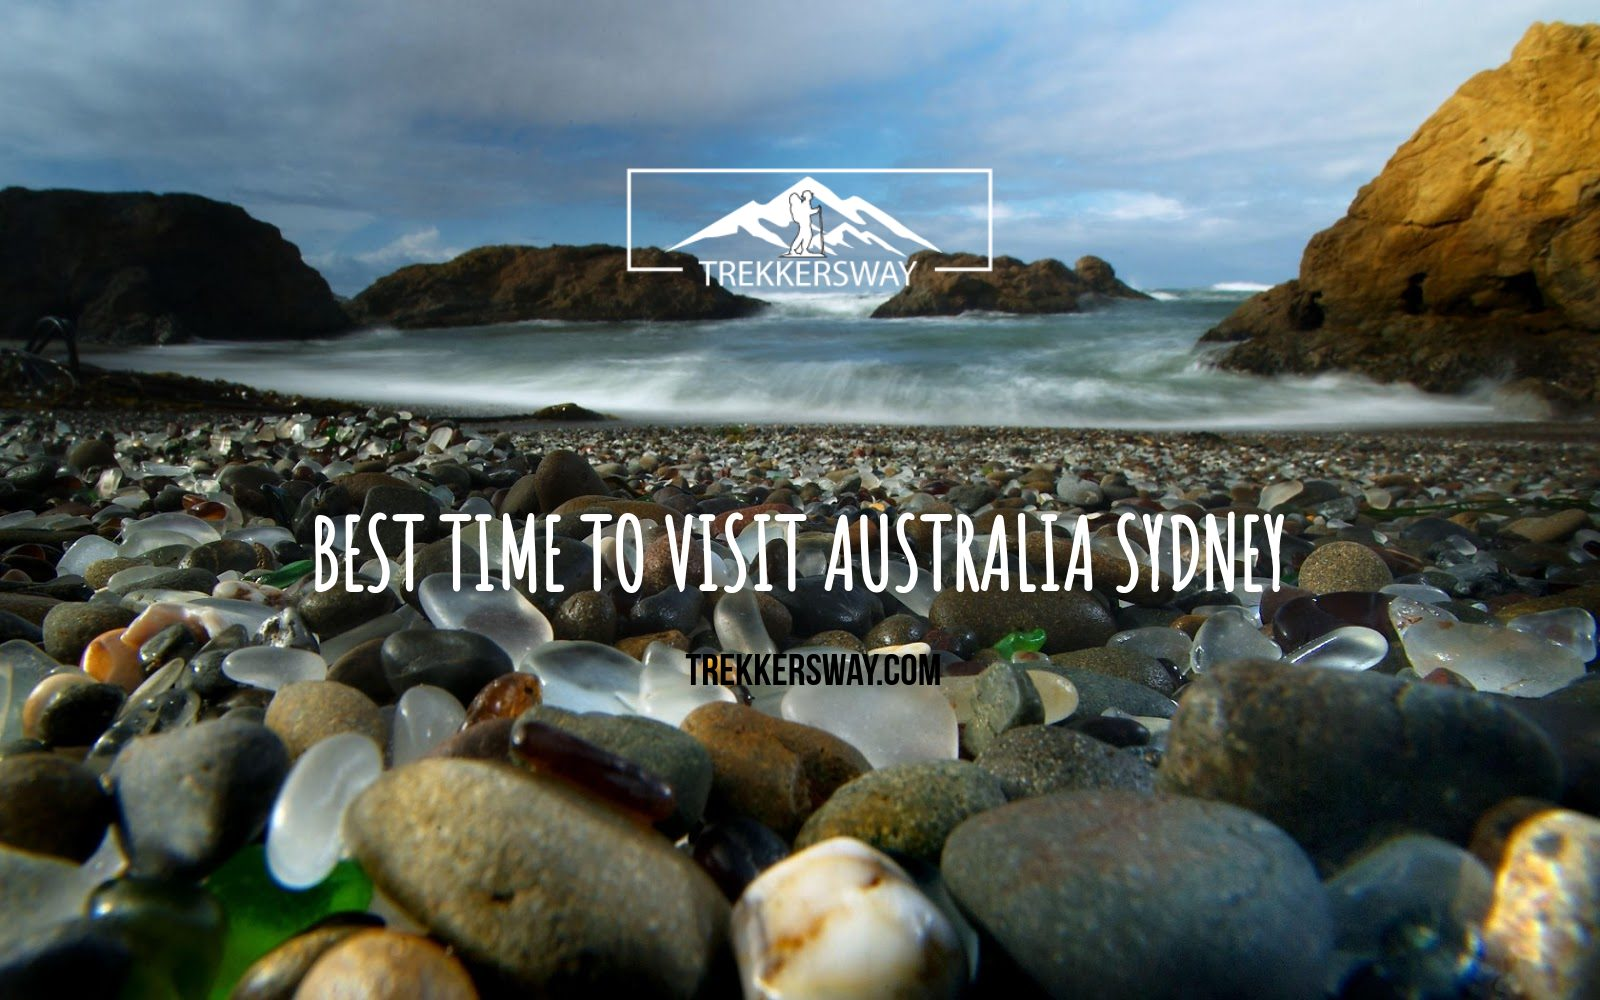 BEST TIME TO VISIT AUSTRALIA SYDNEY